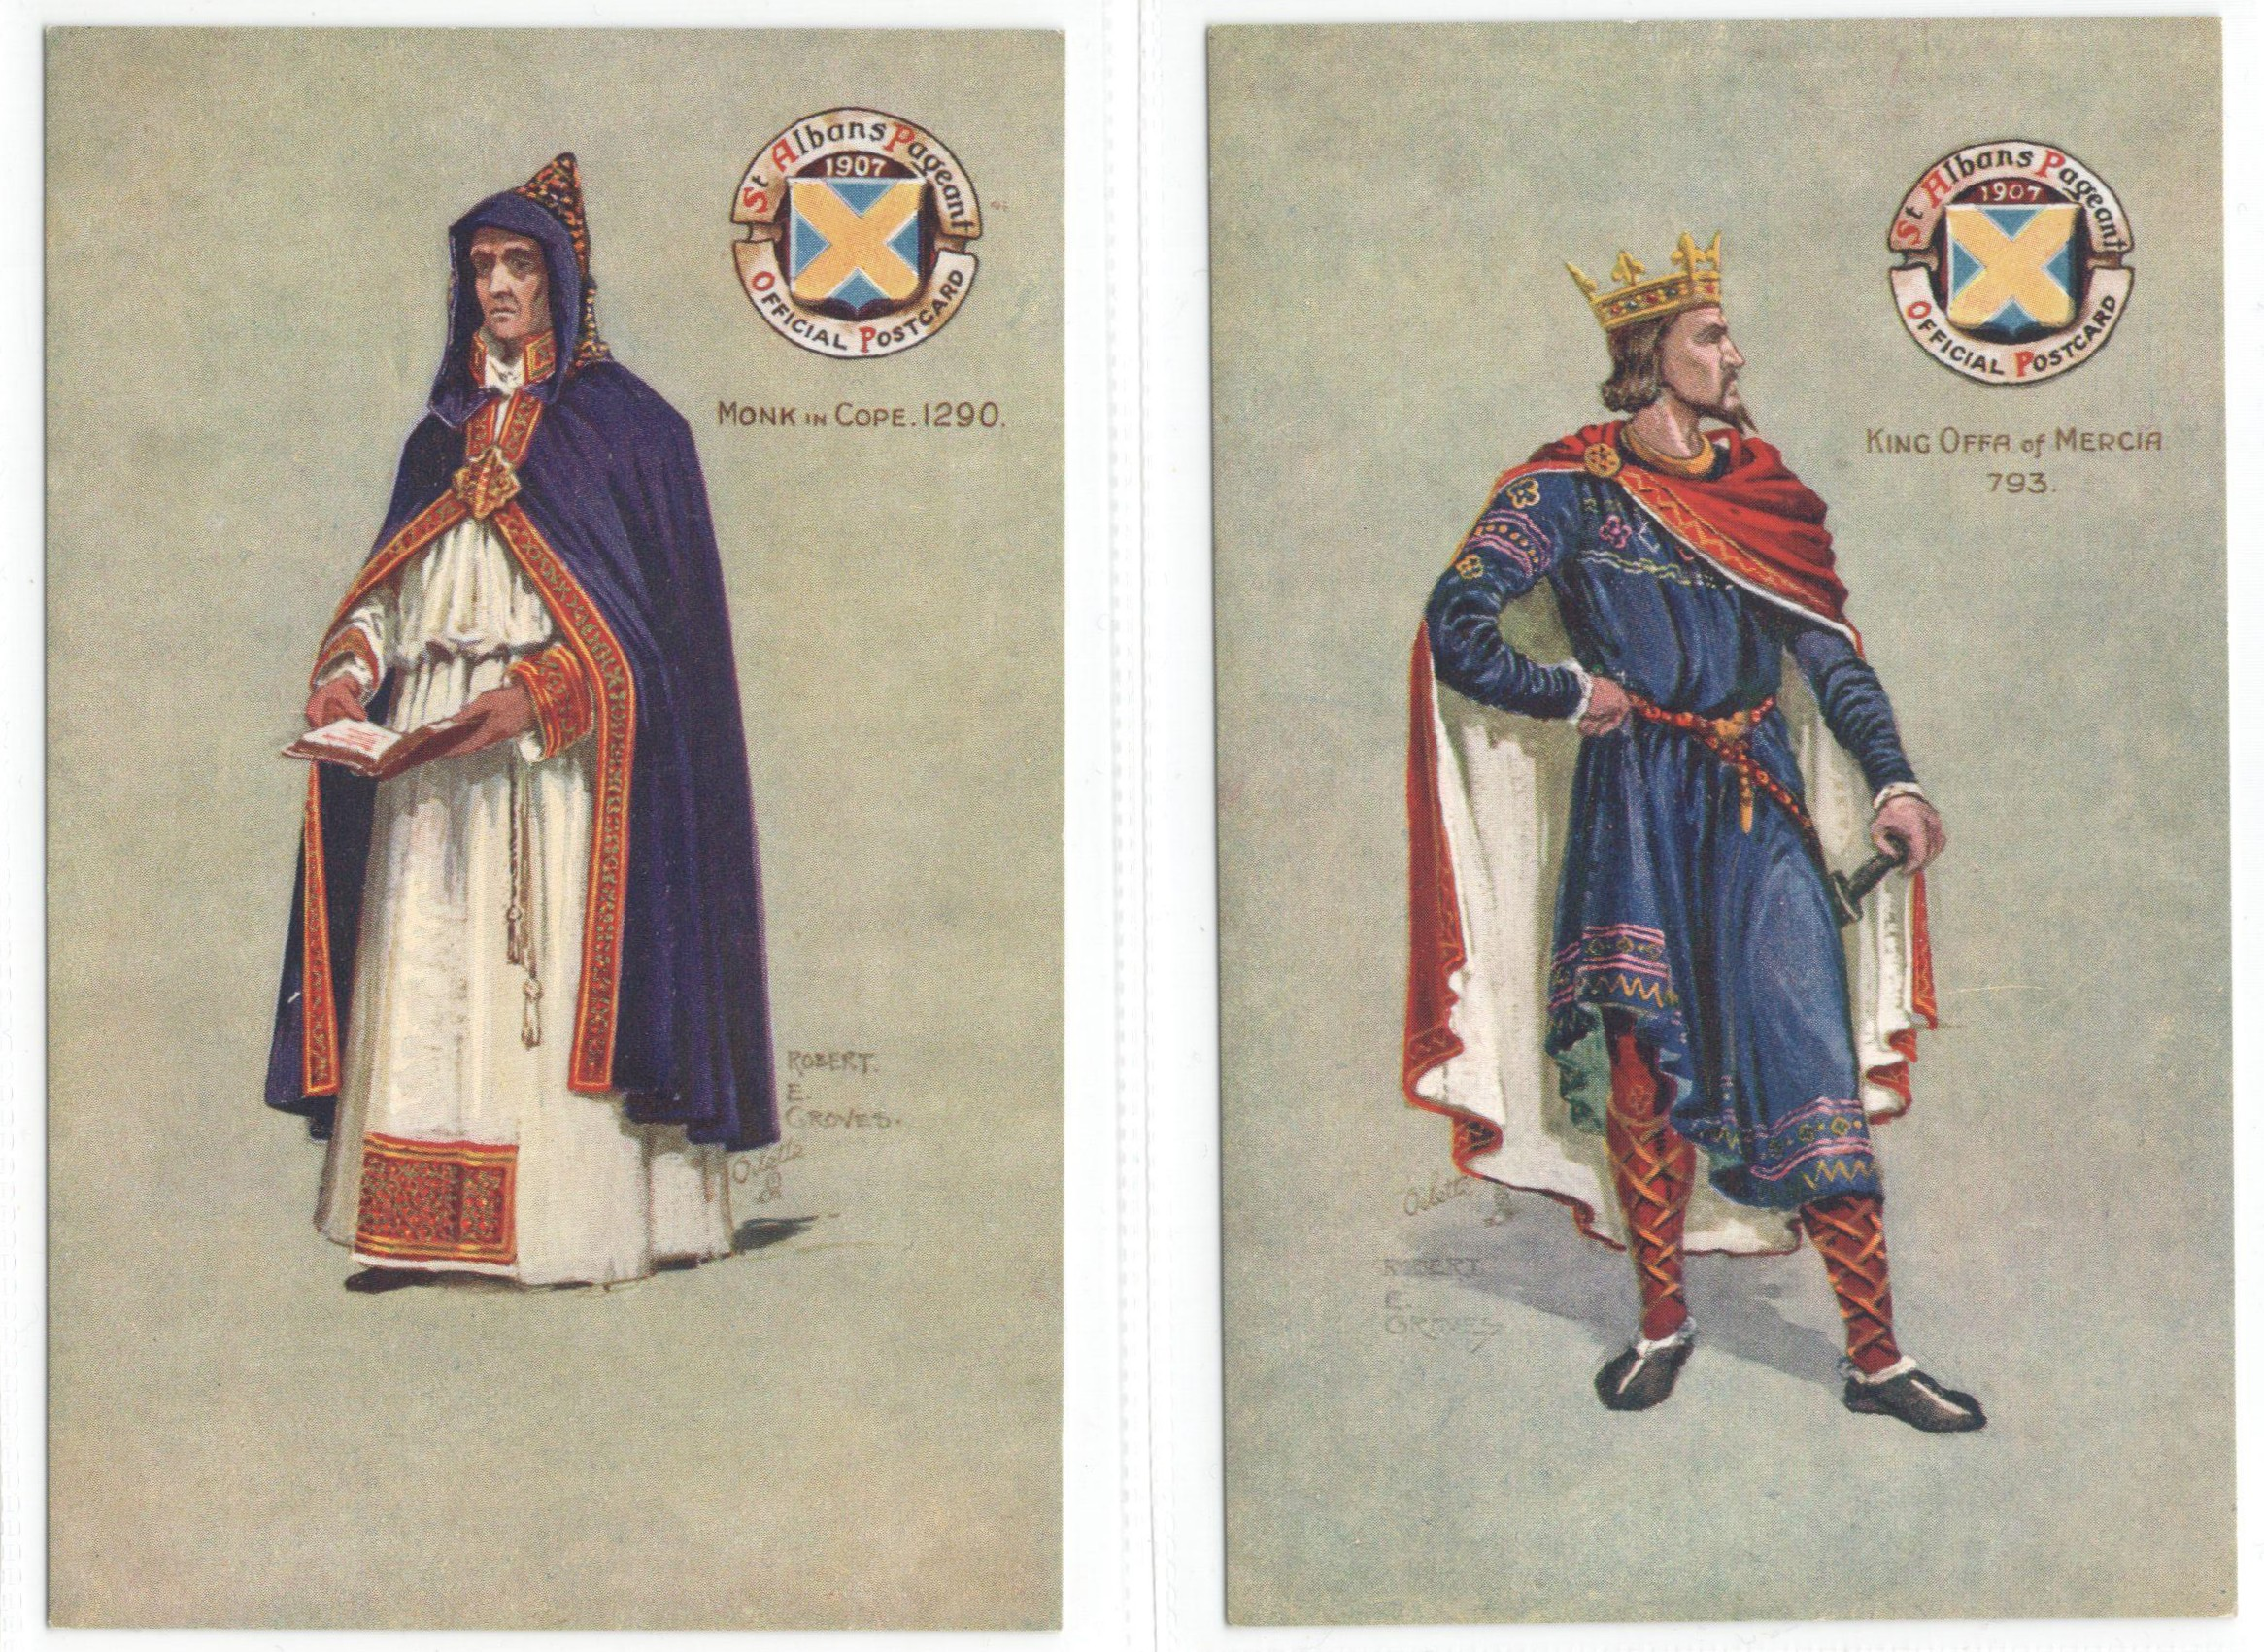 ST ALBANS PAGEANTS SERIES I, II & III - SIX RAPHAEL TUCK POSTCARDS - Image 3 of 6